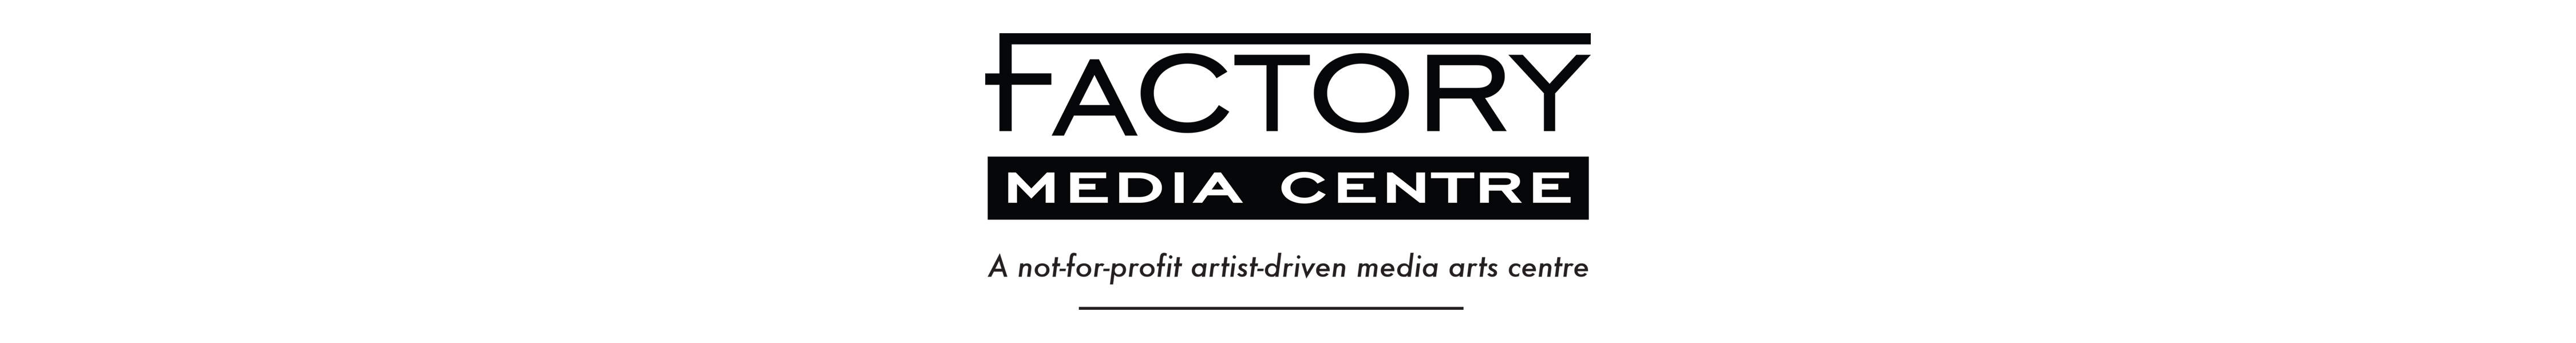 Factory Media Centre